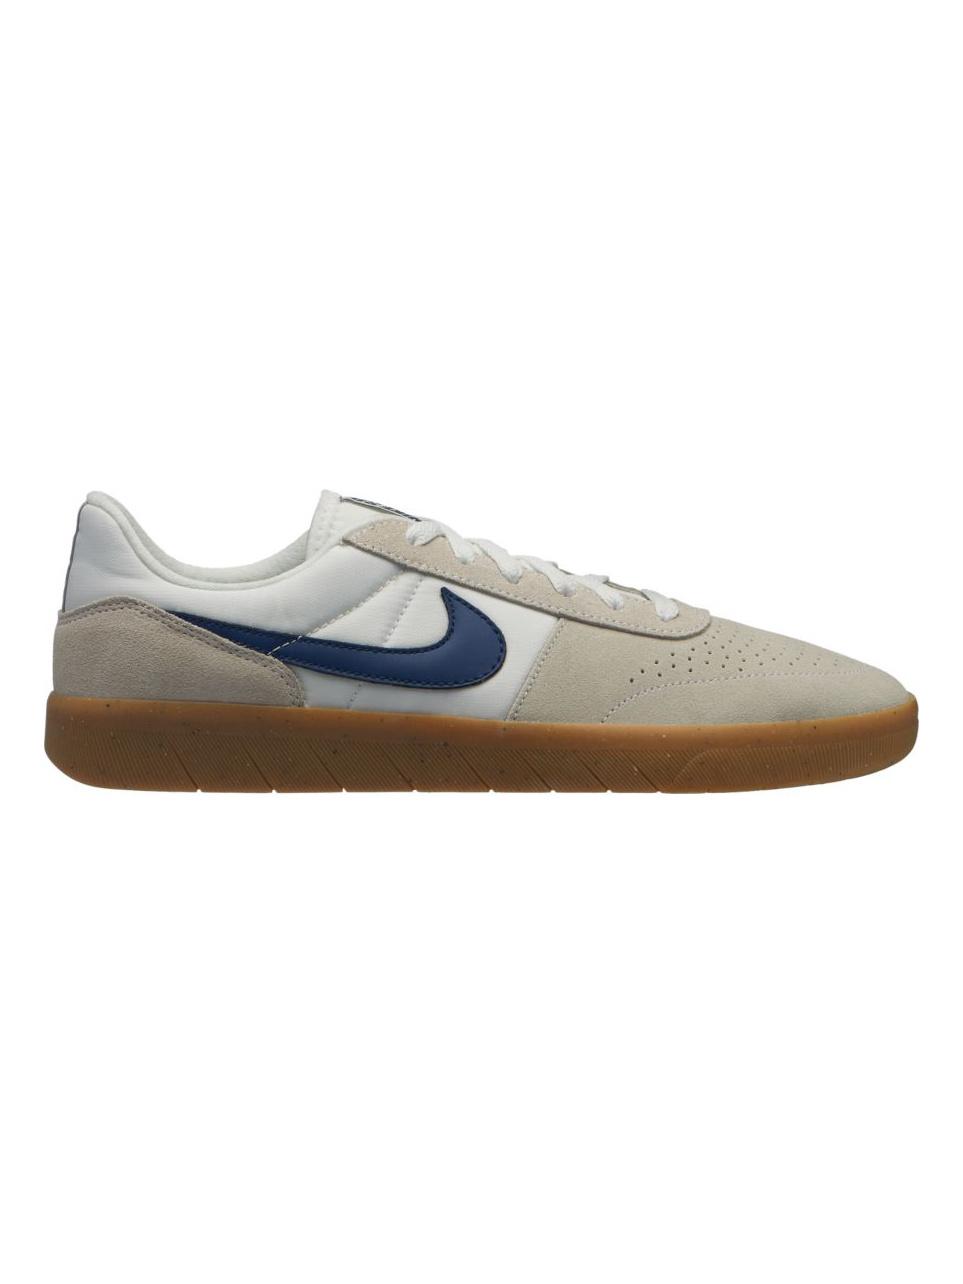 nike sb sb team classic shoe